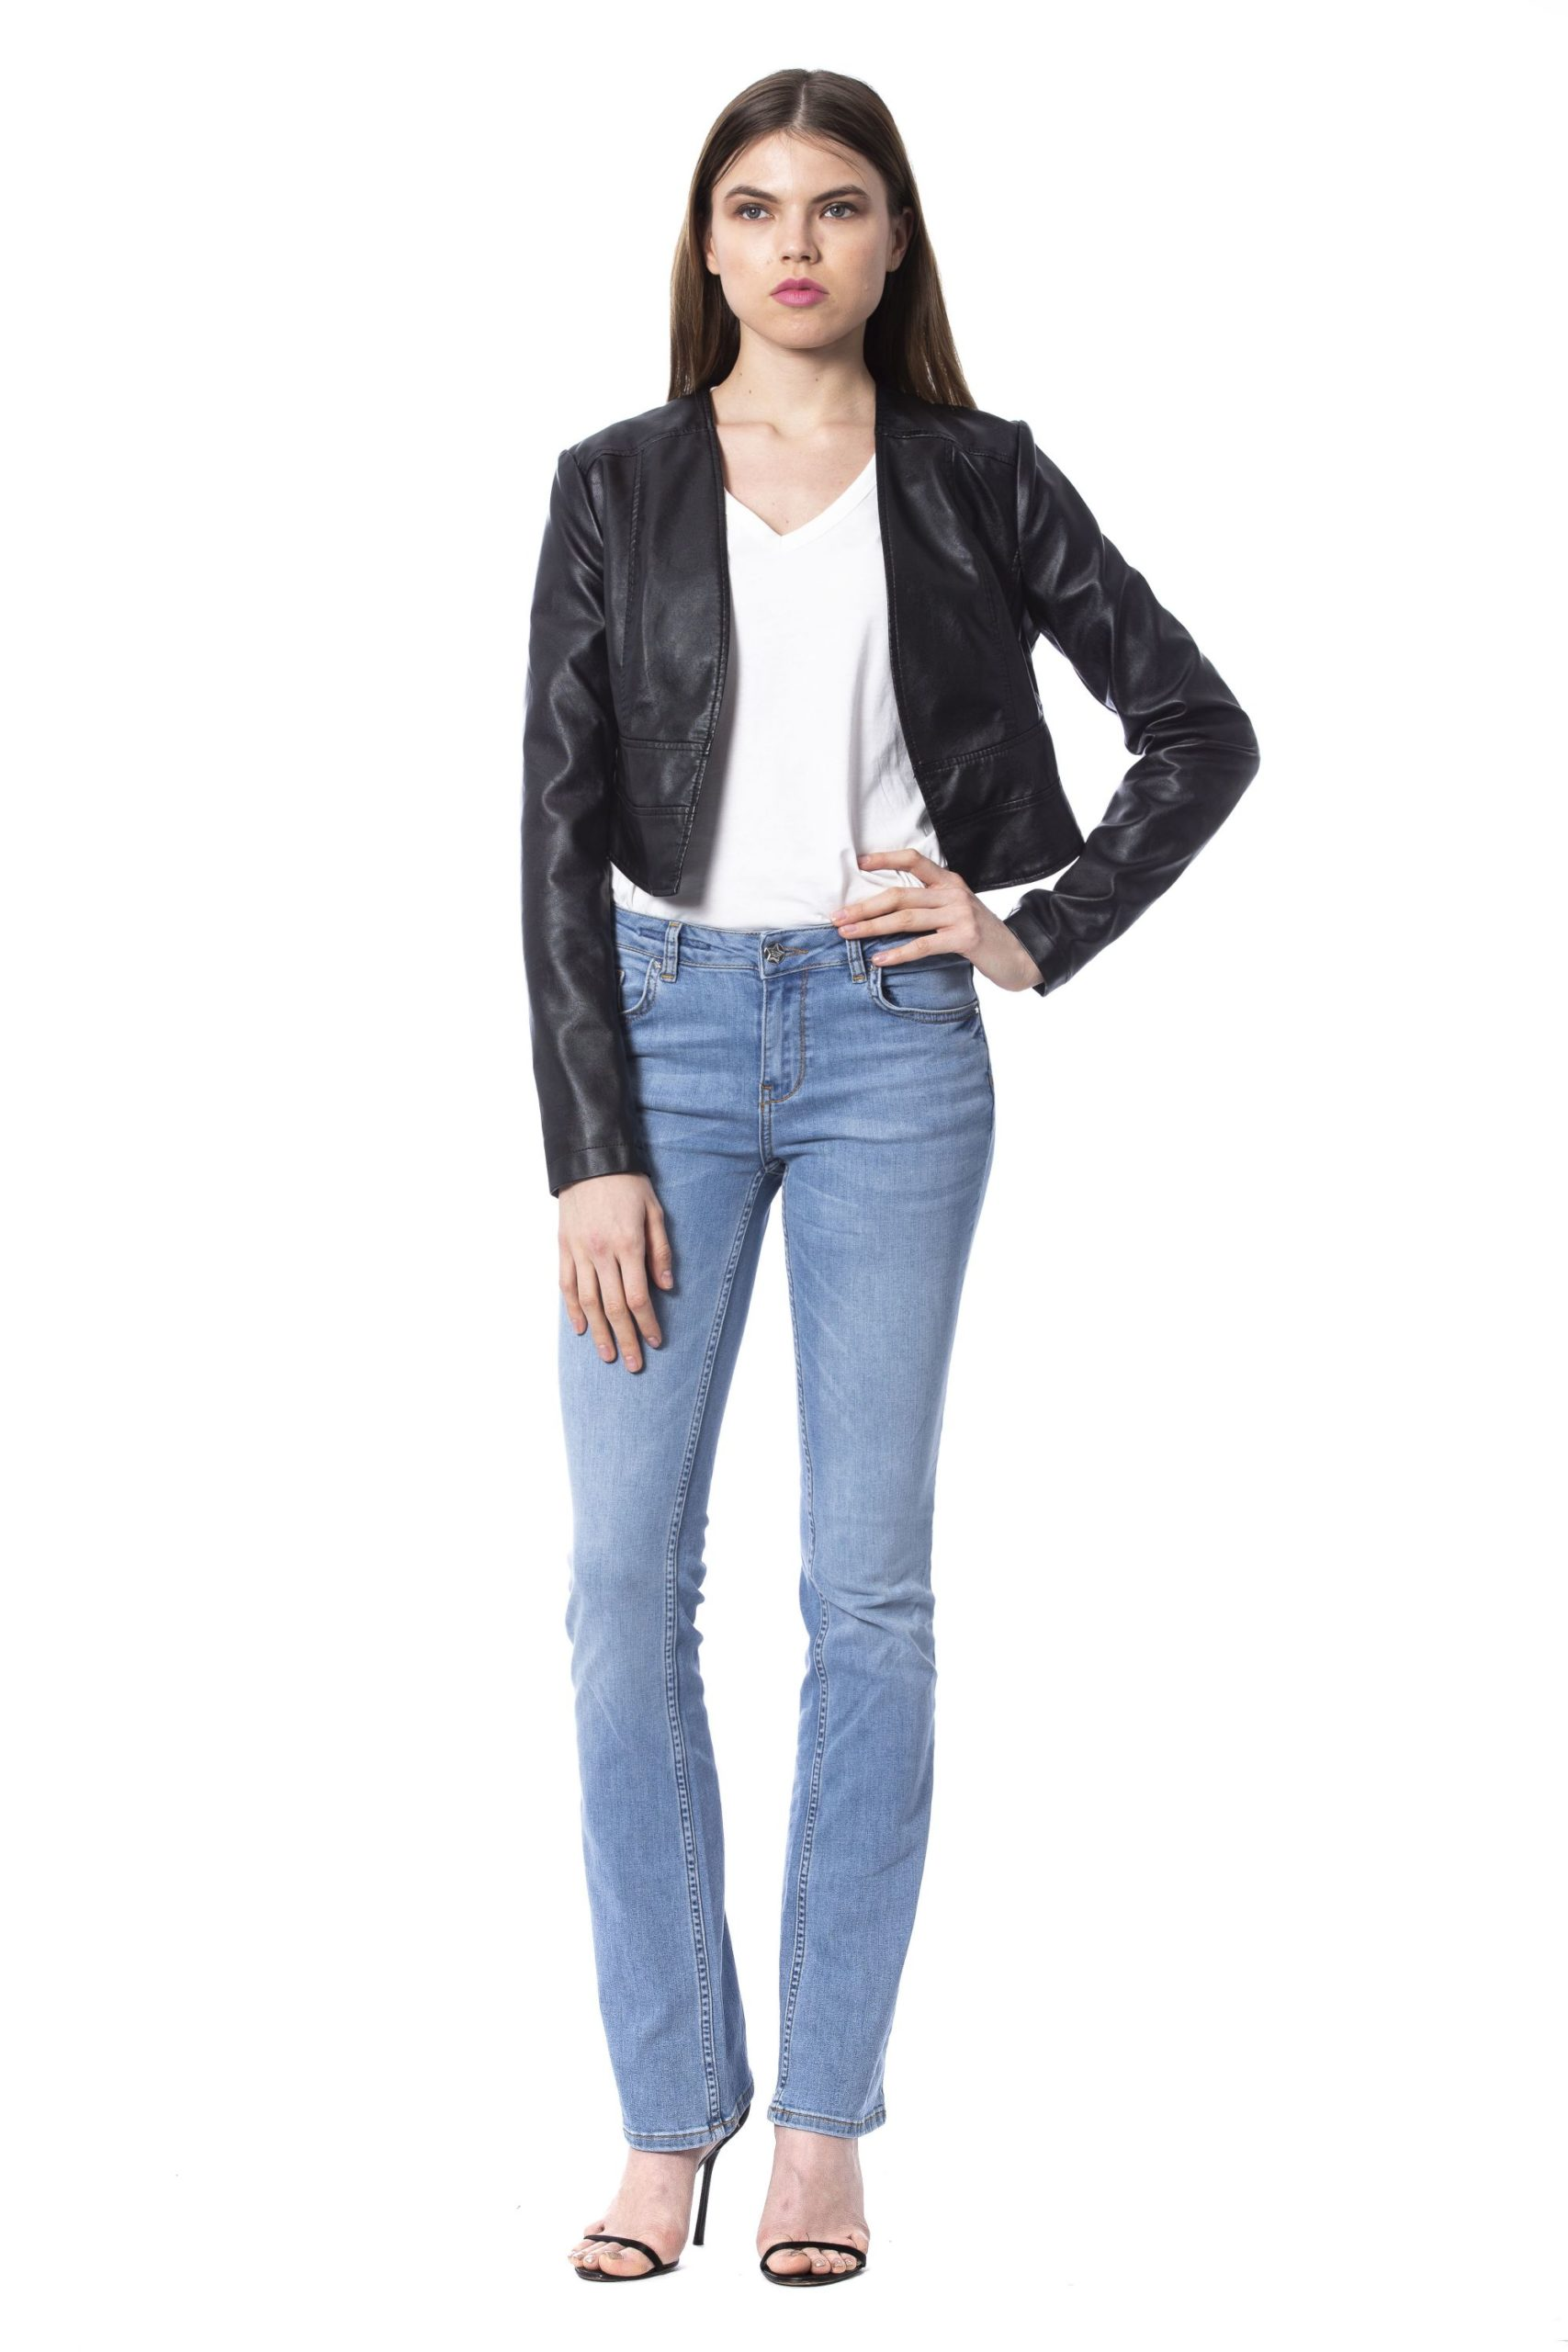 Silvian Heach Women's Jackets Black SI993926 - S